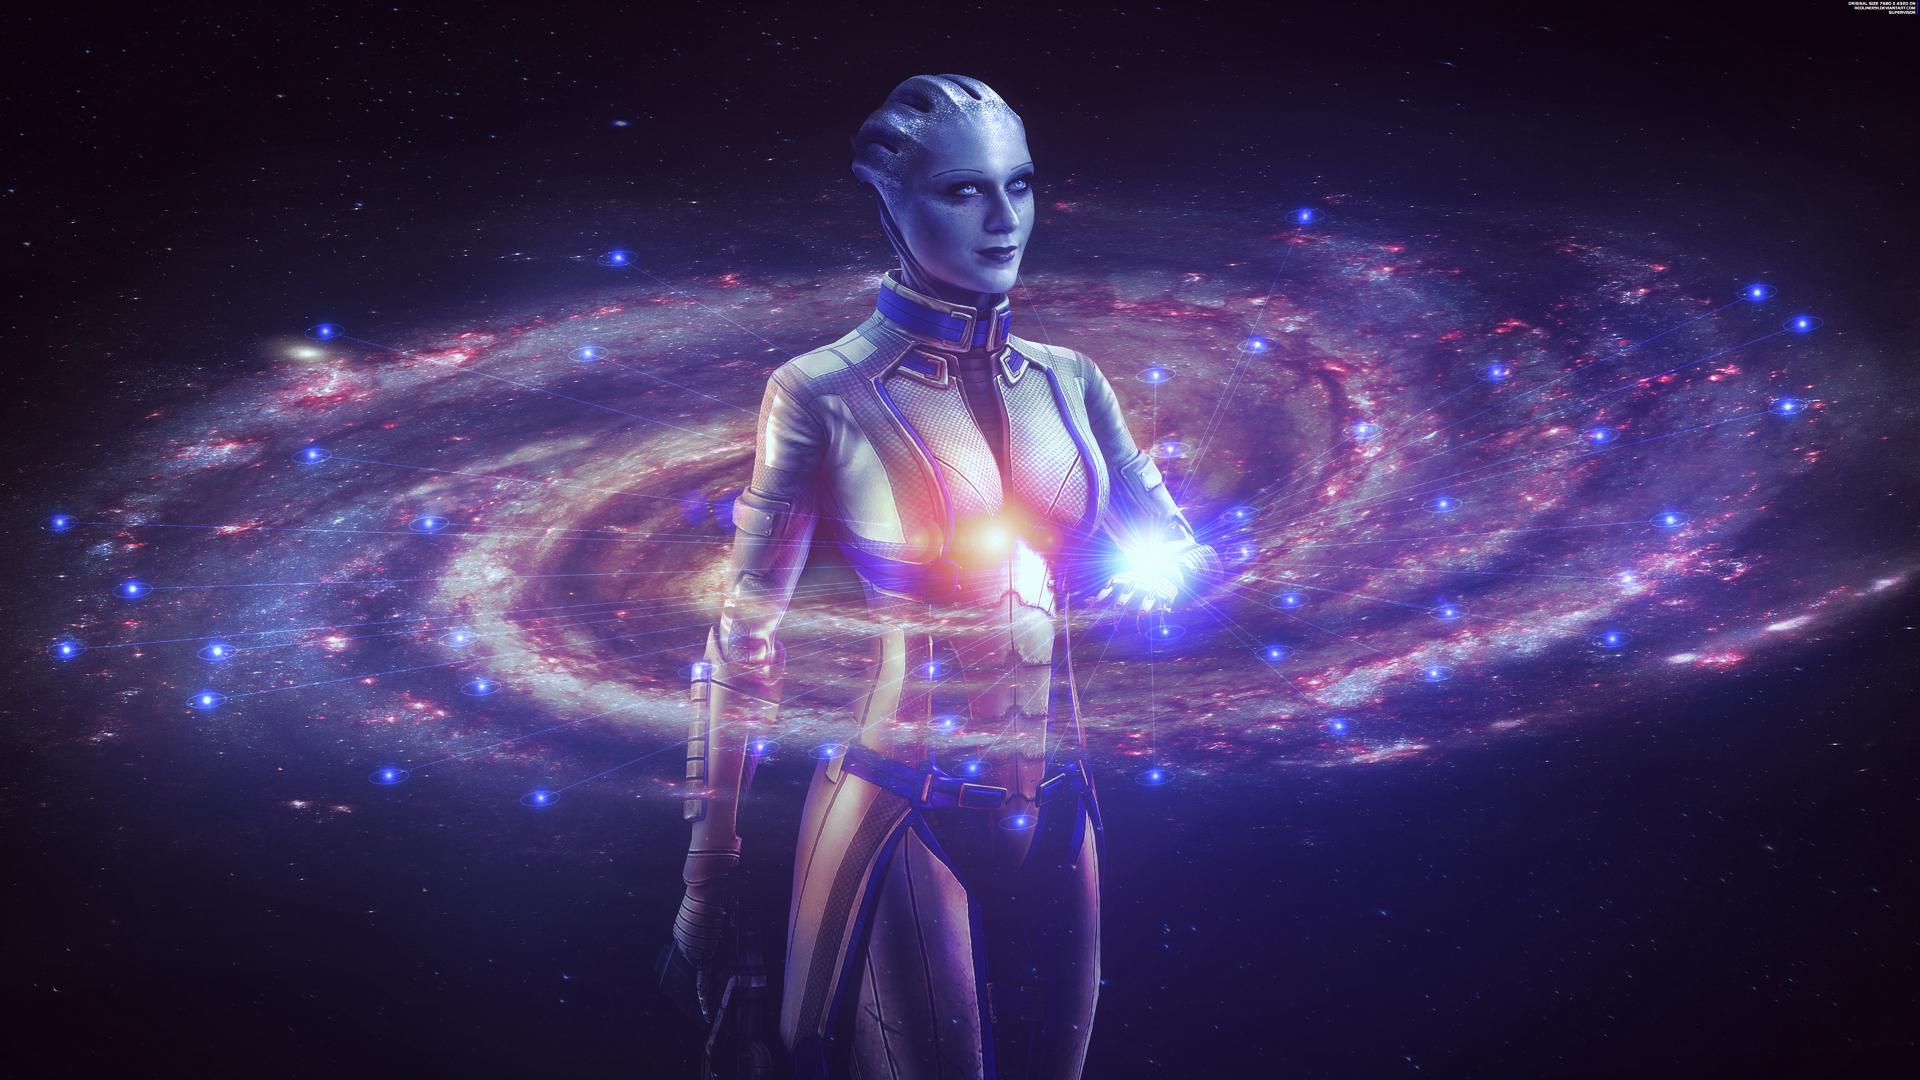 1920x1080 Mass Effect Liara 8k Laptop Full HD 1080P HD 4k ...